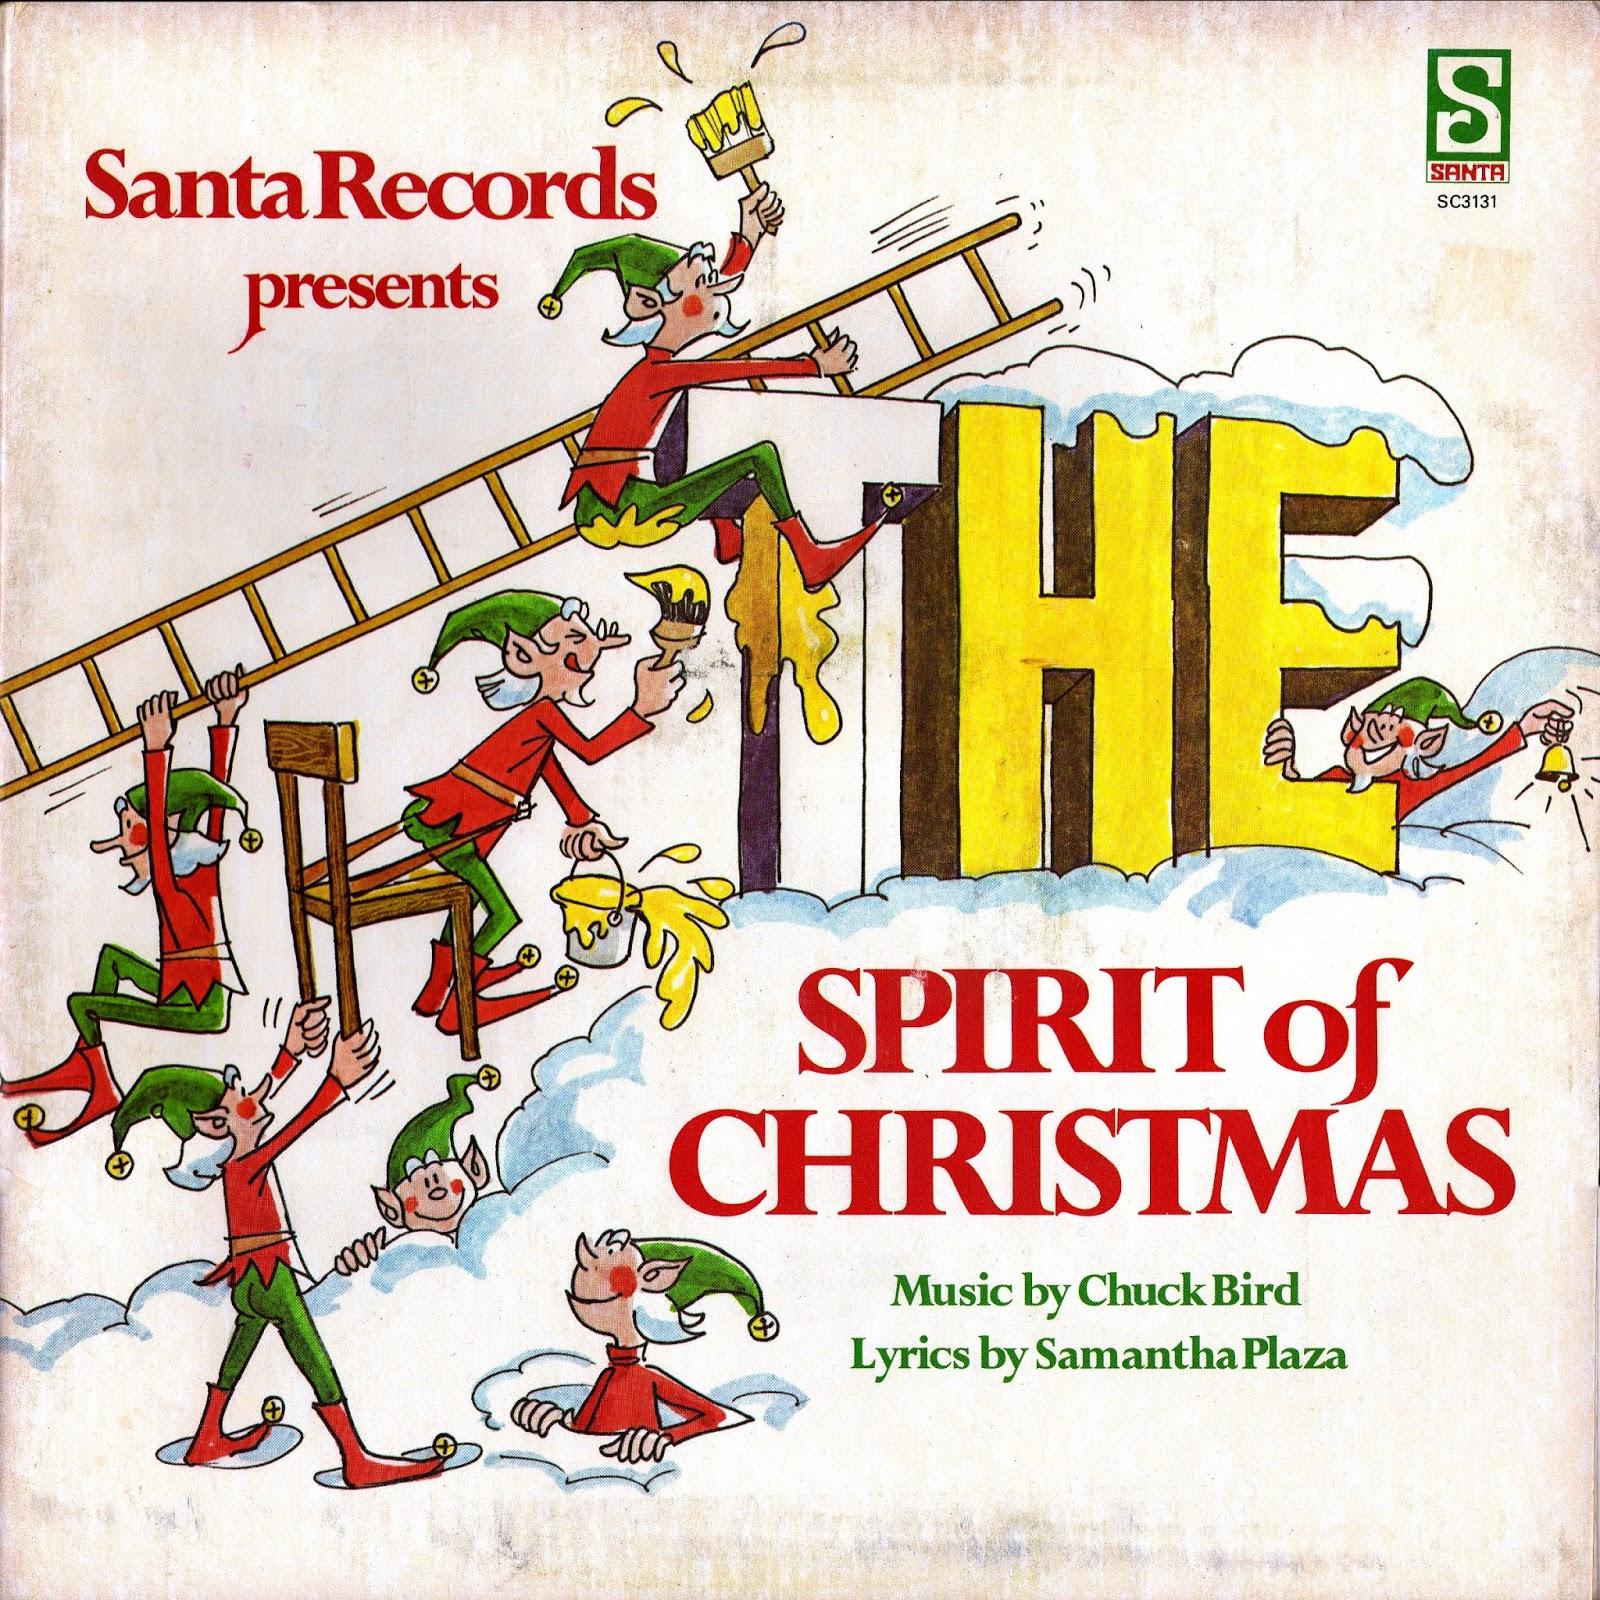 Ernie (Not Bert): Christmas Spirit